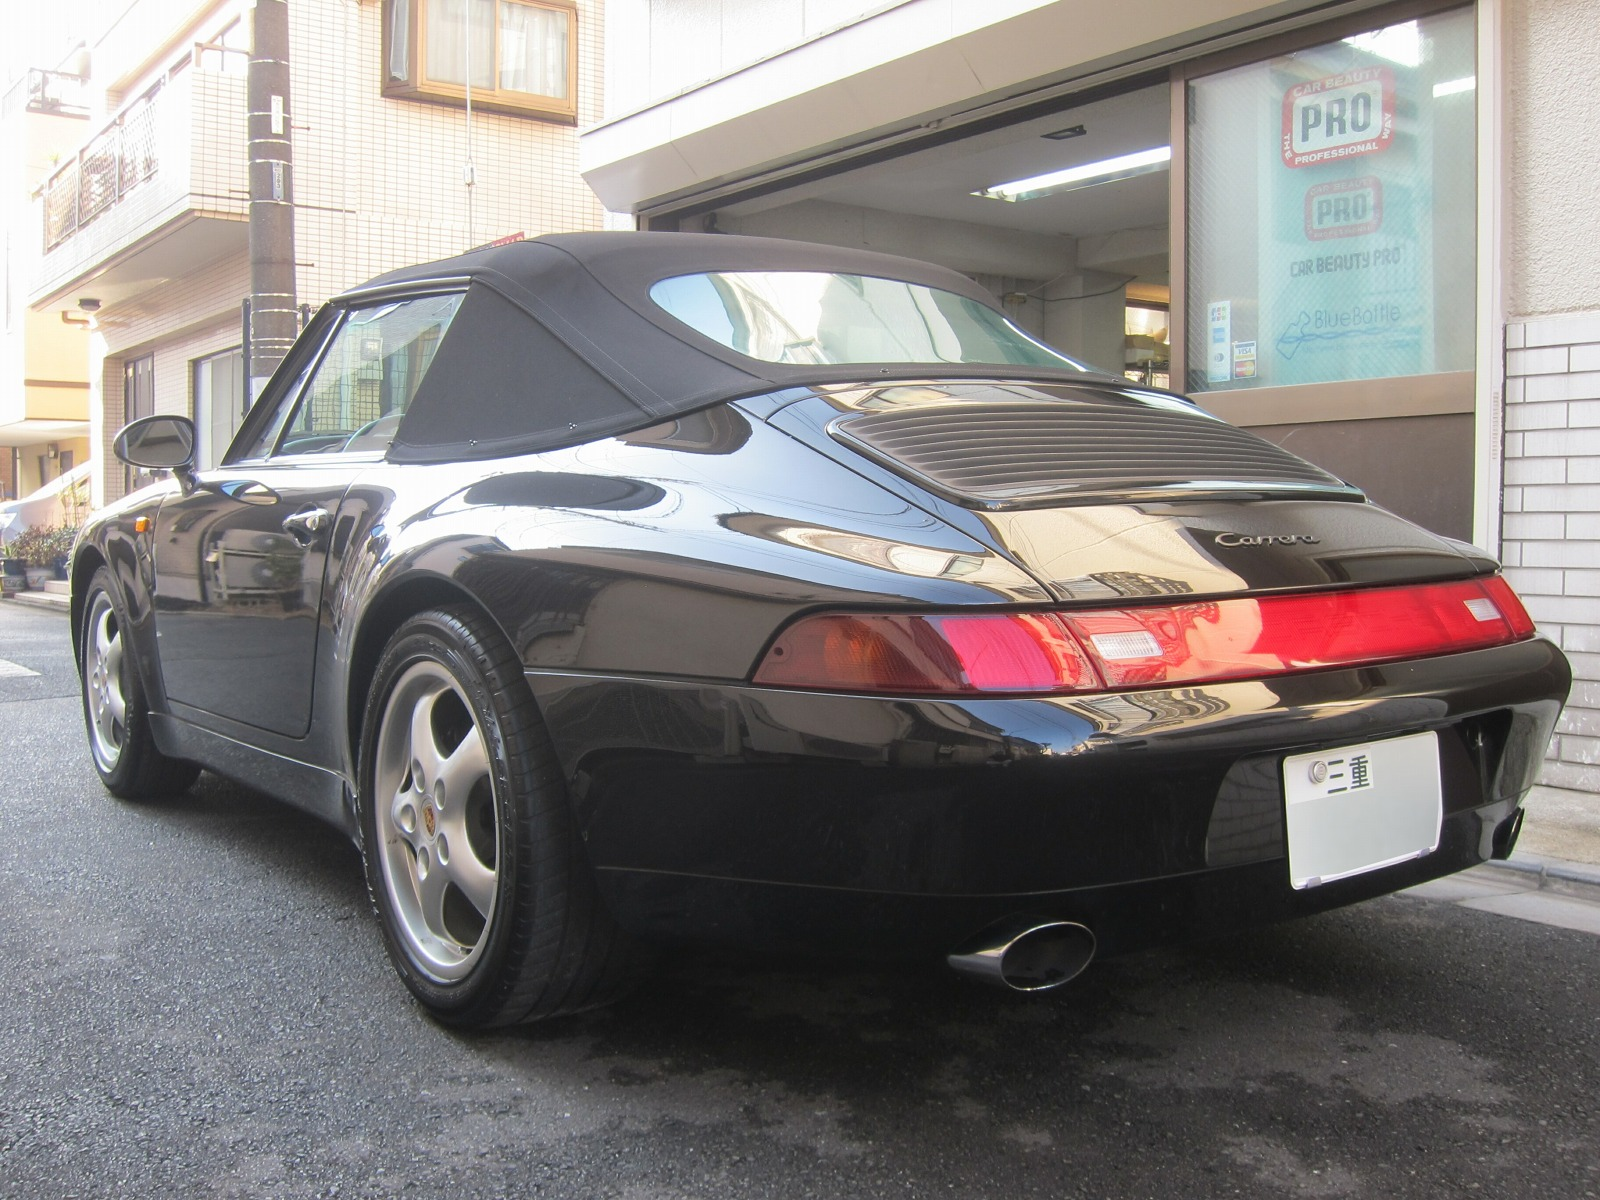 20150909-porsche-911-carrera-cabriolet-21